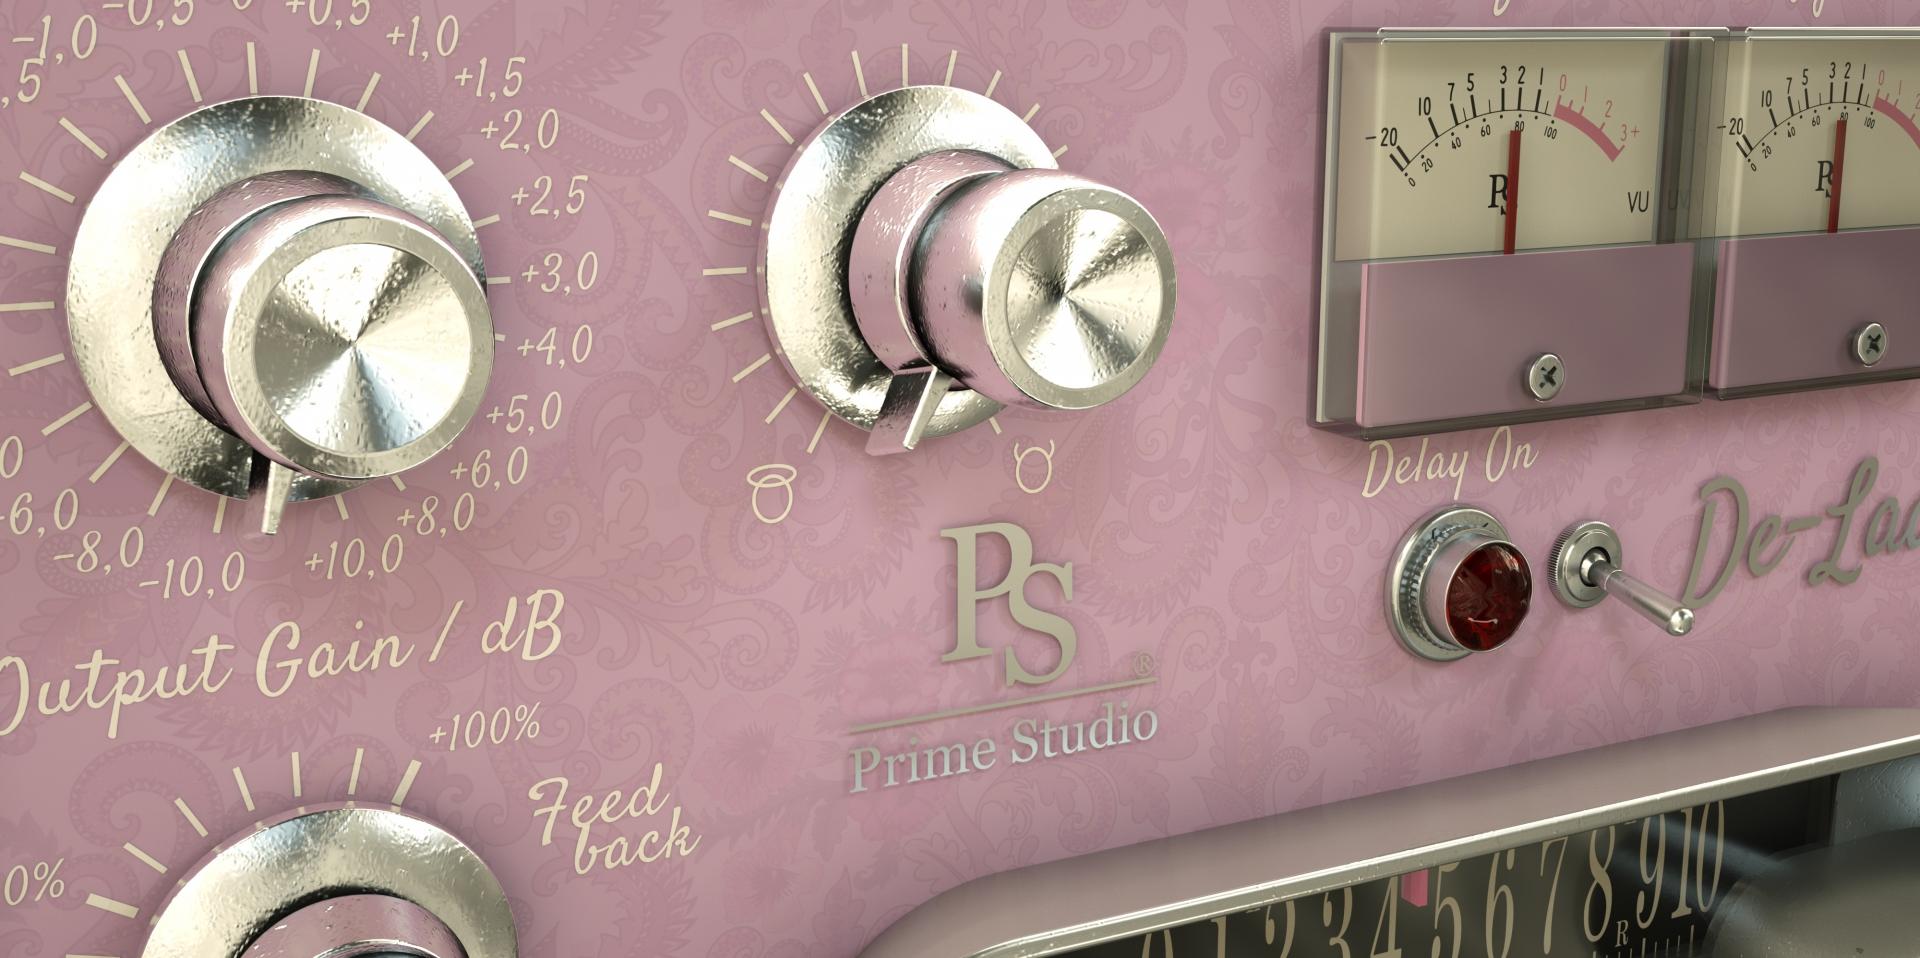 Prime_Studio®_De-Lady